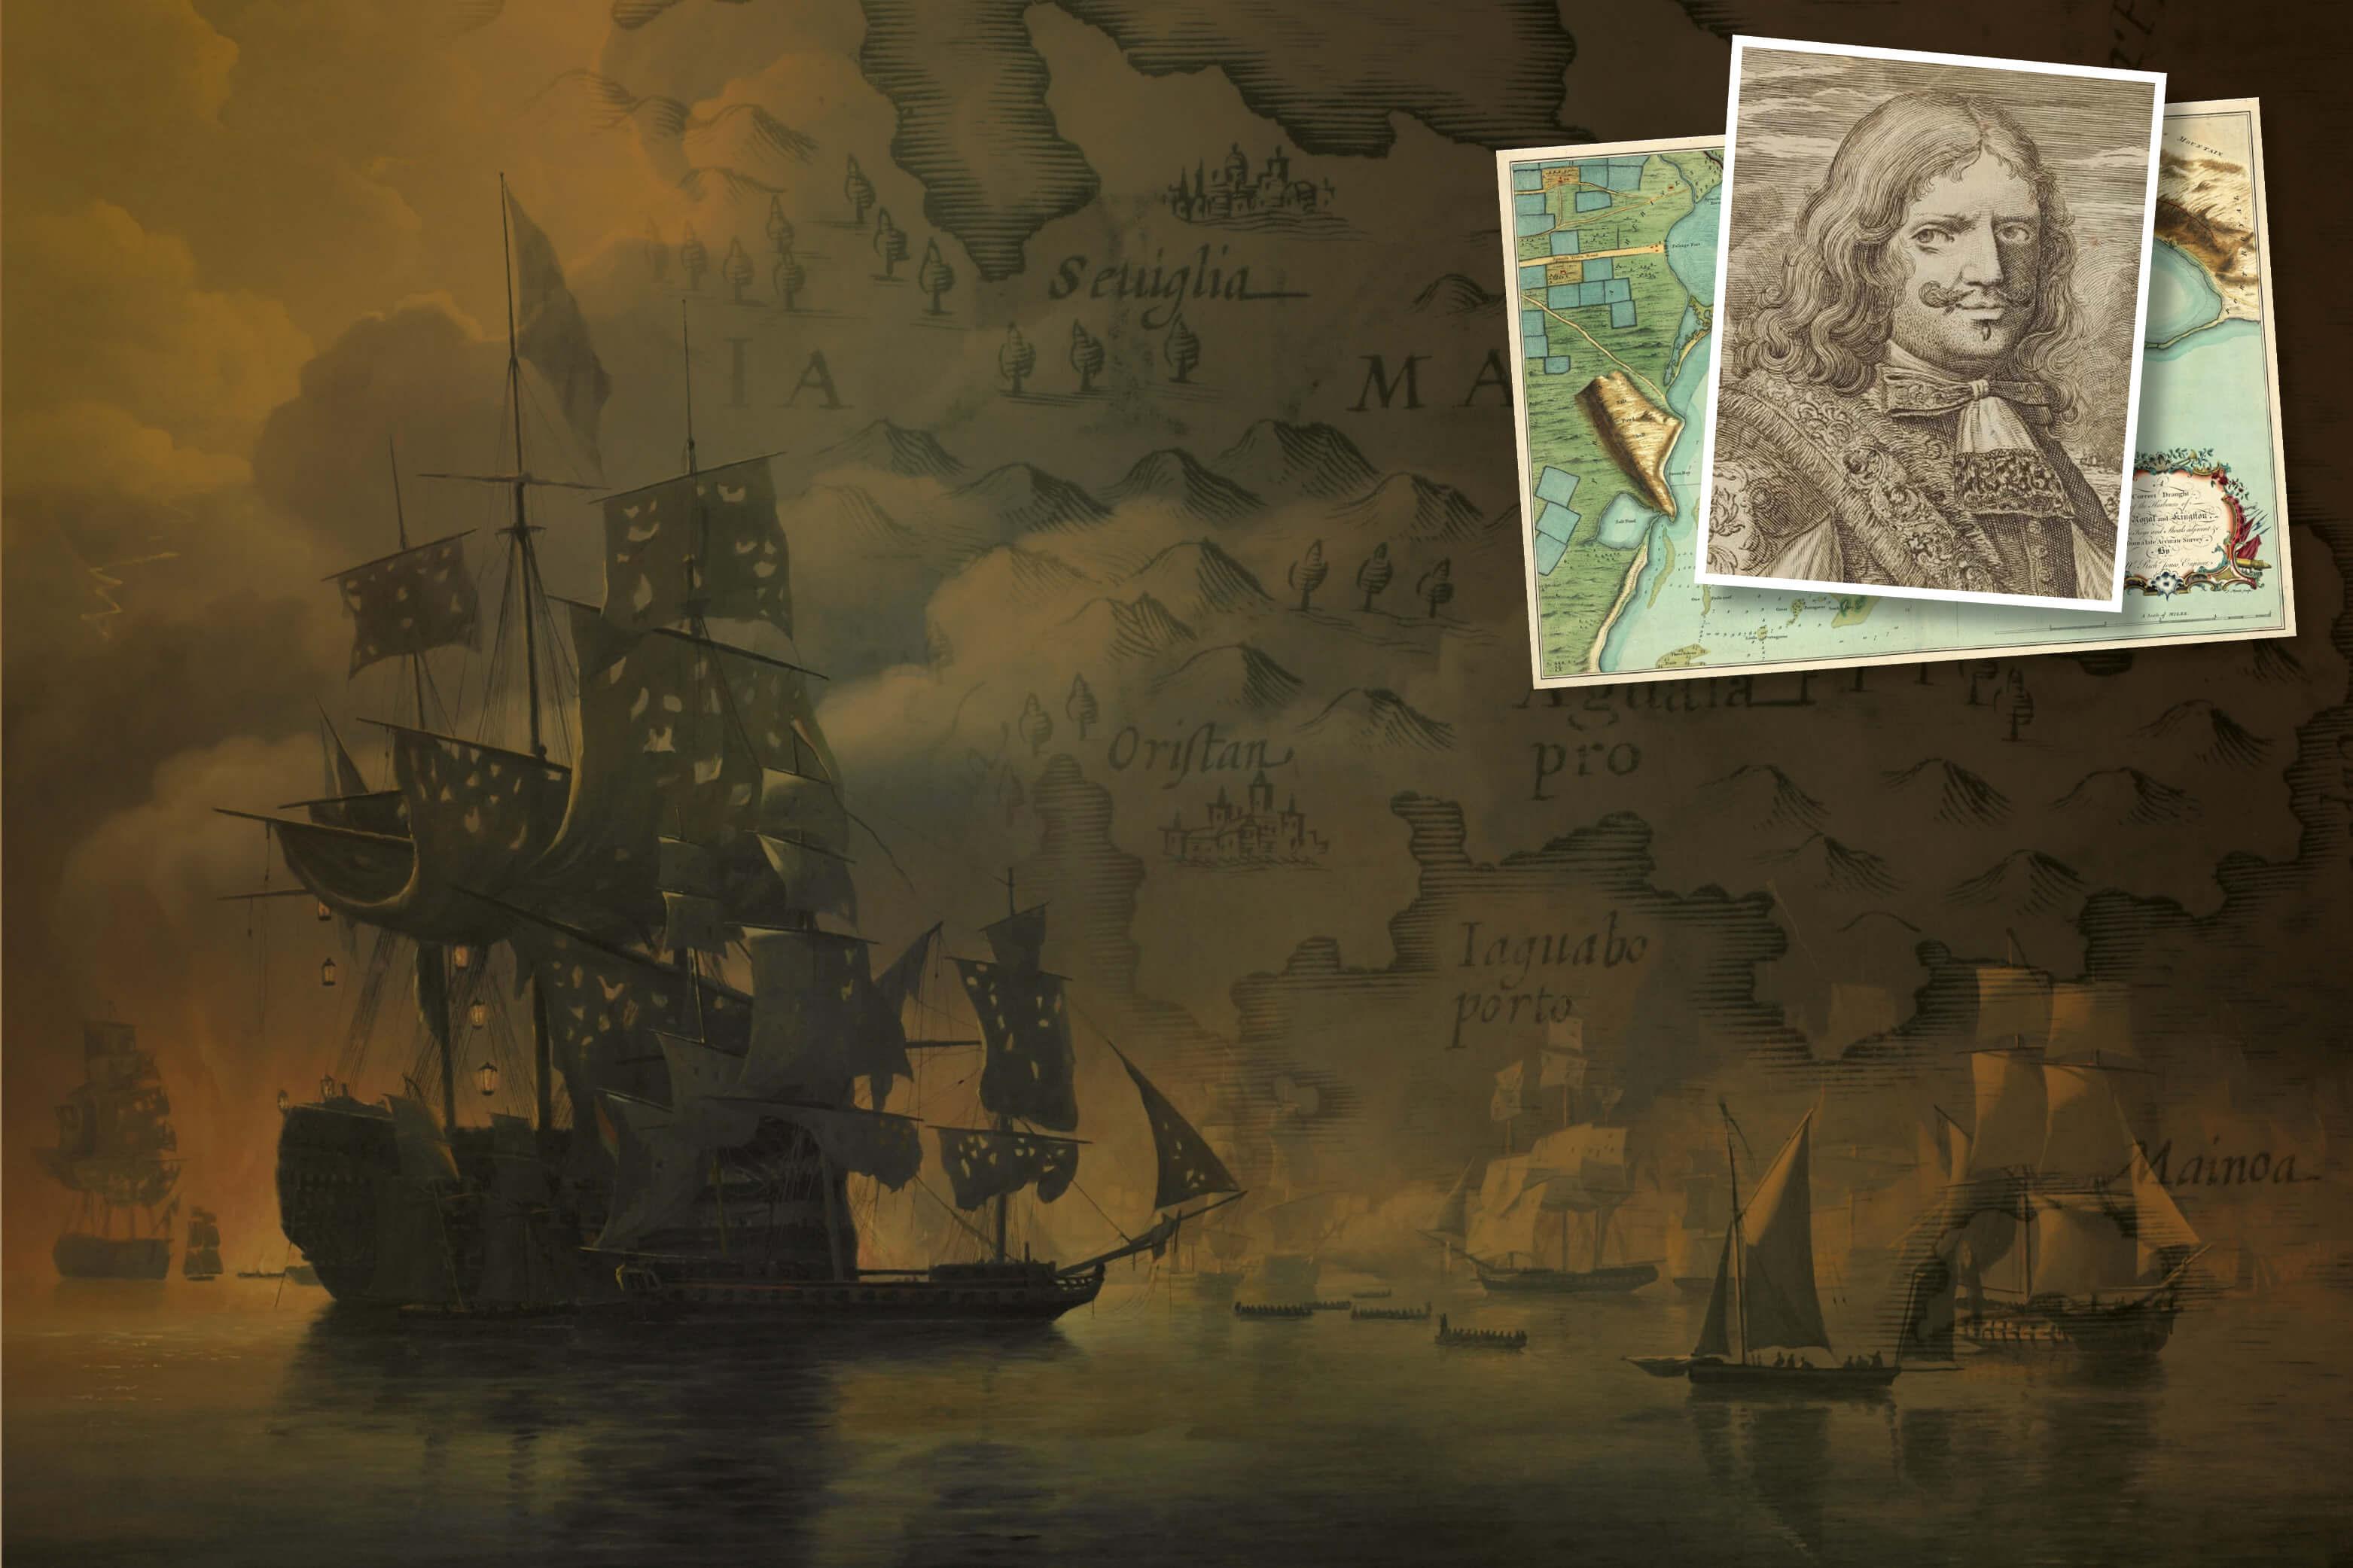 Kaper of piratenkoning?